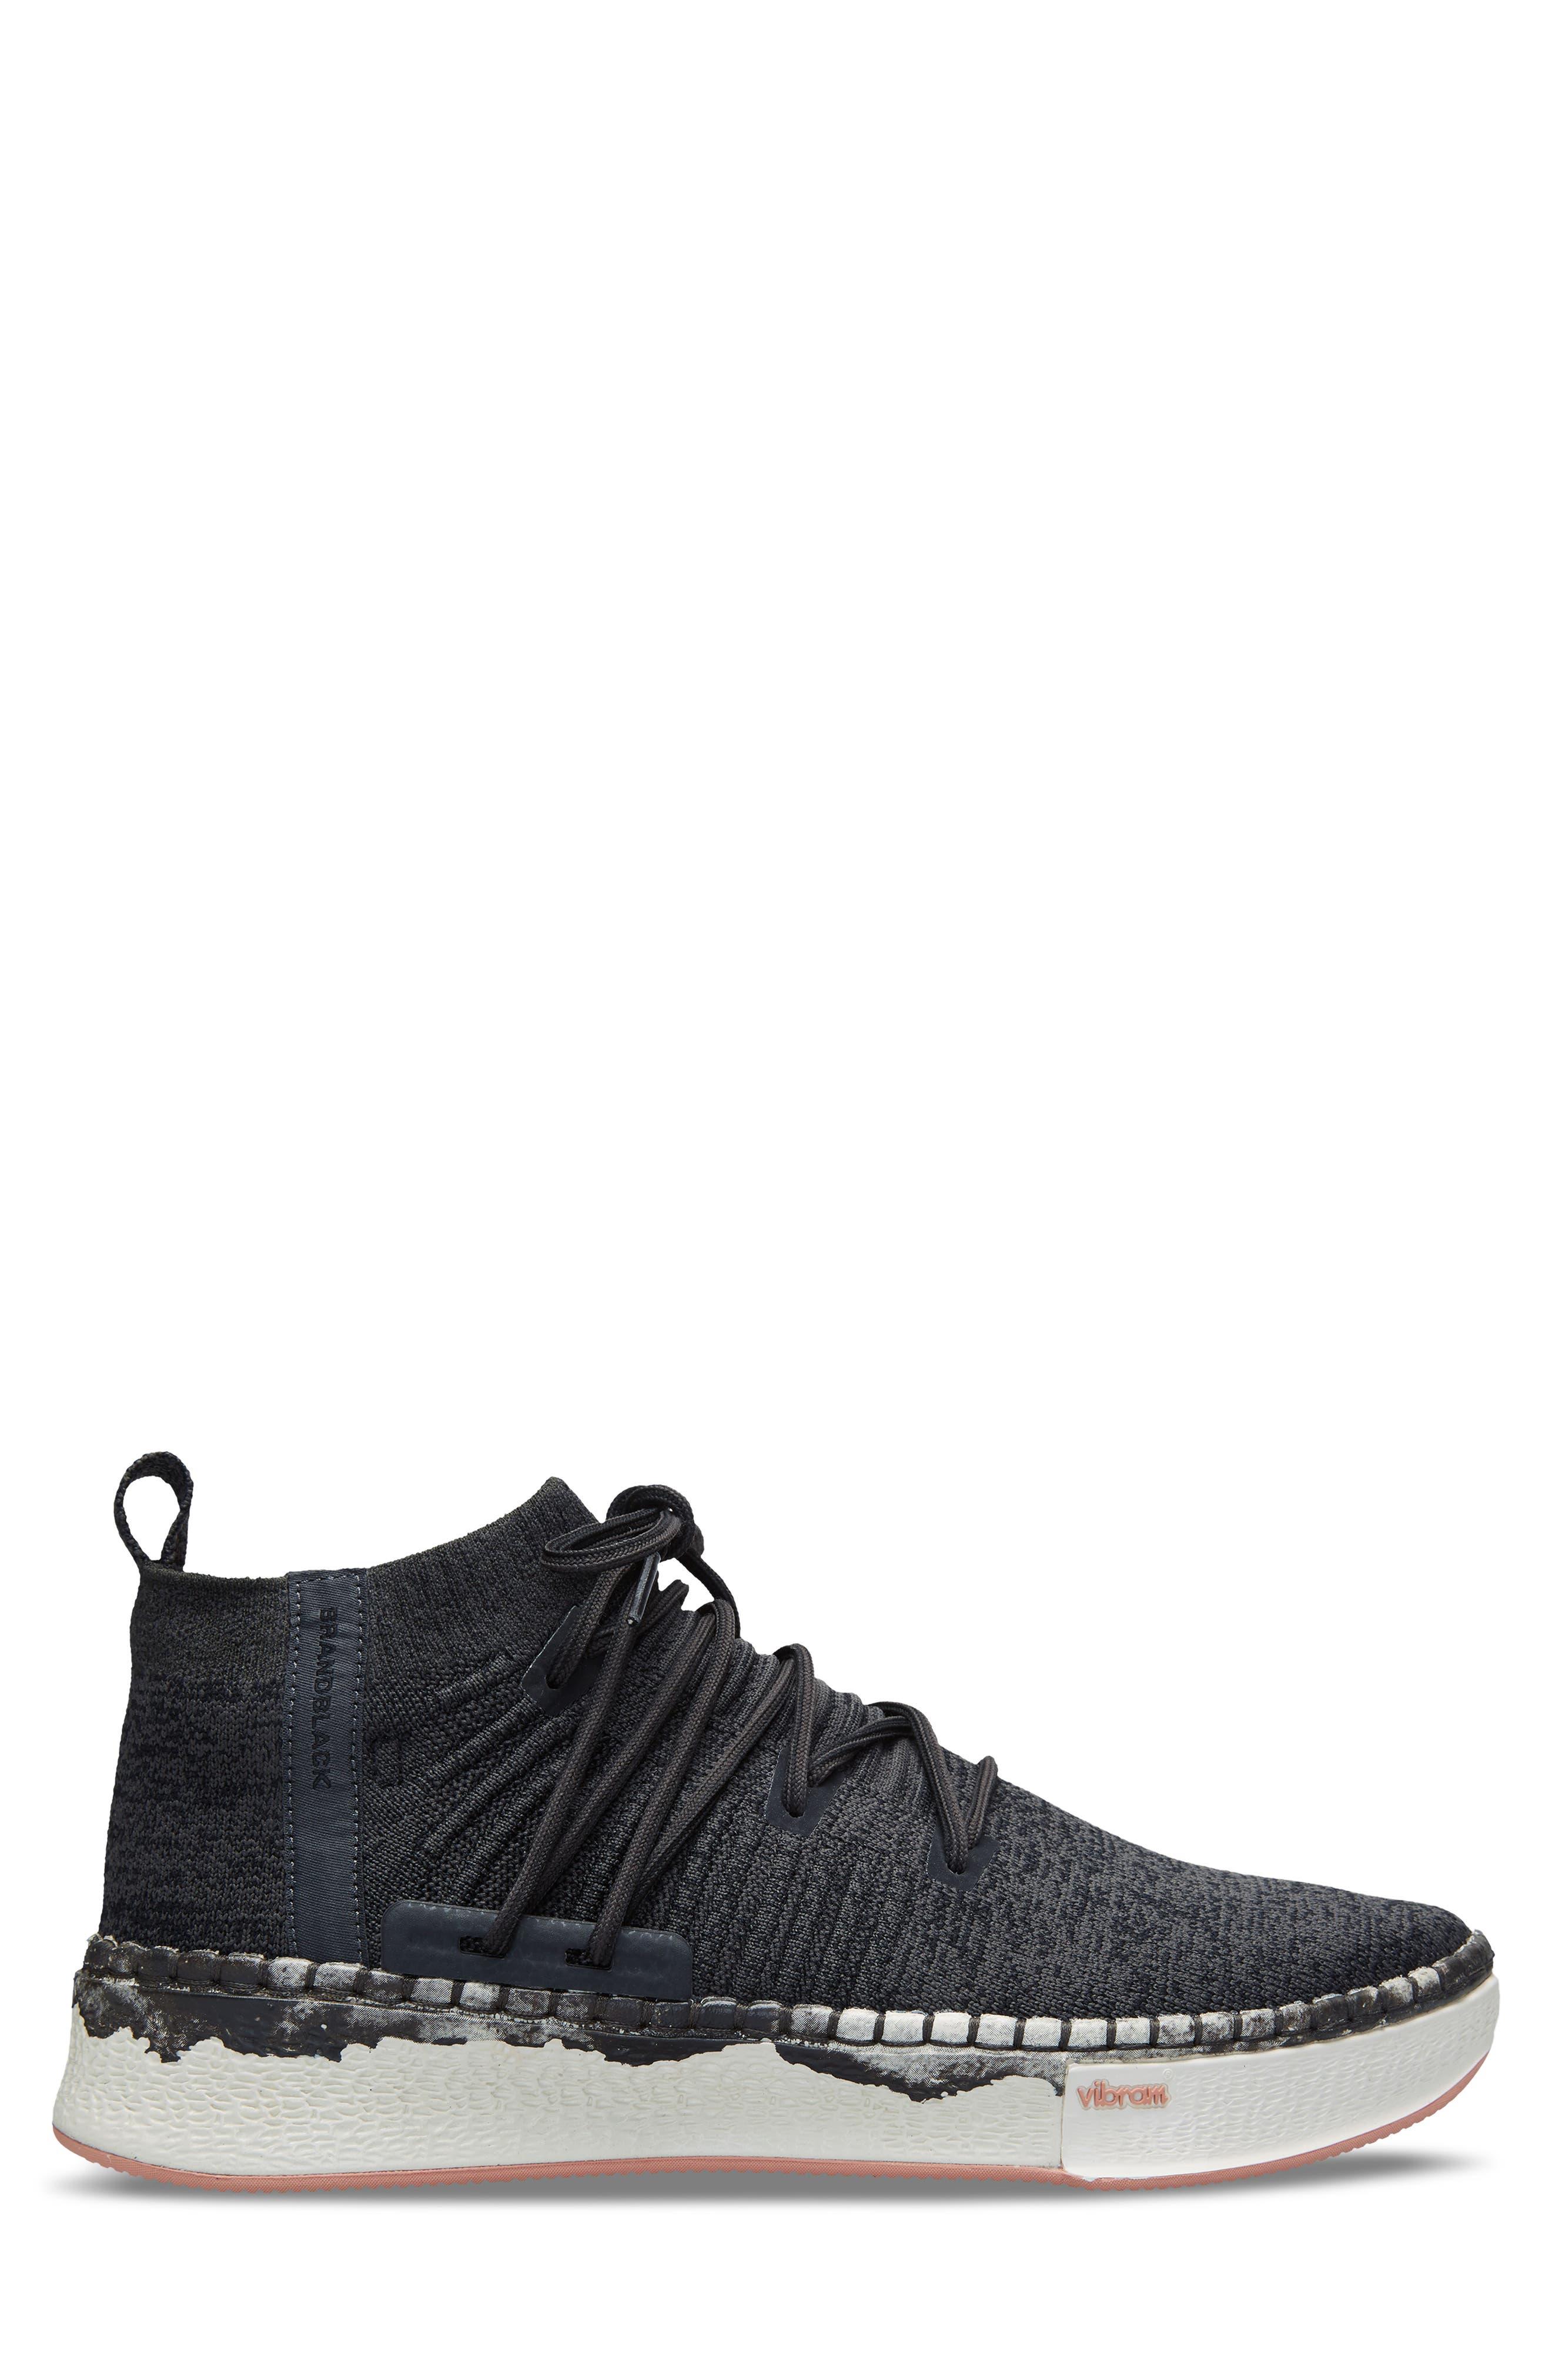 Delta Shibori Sneaker,                             Alternate thumbnail 3, color,                             011